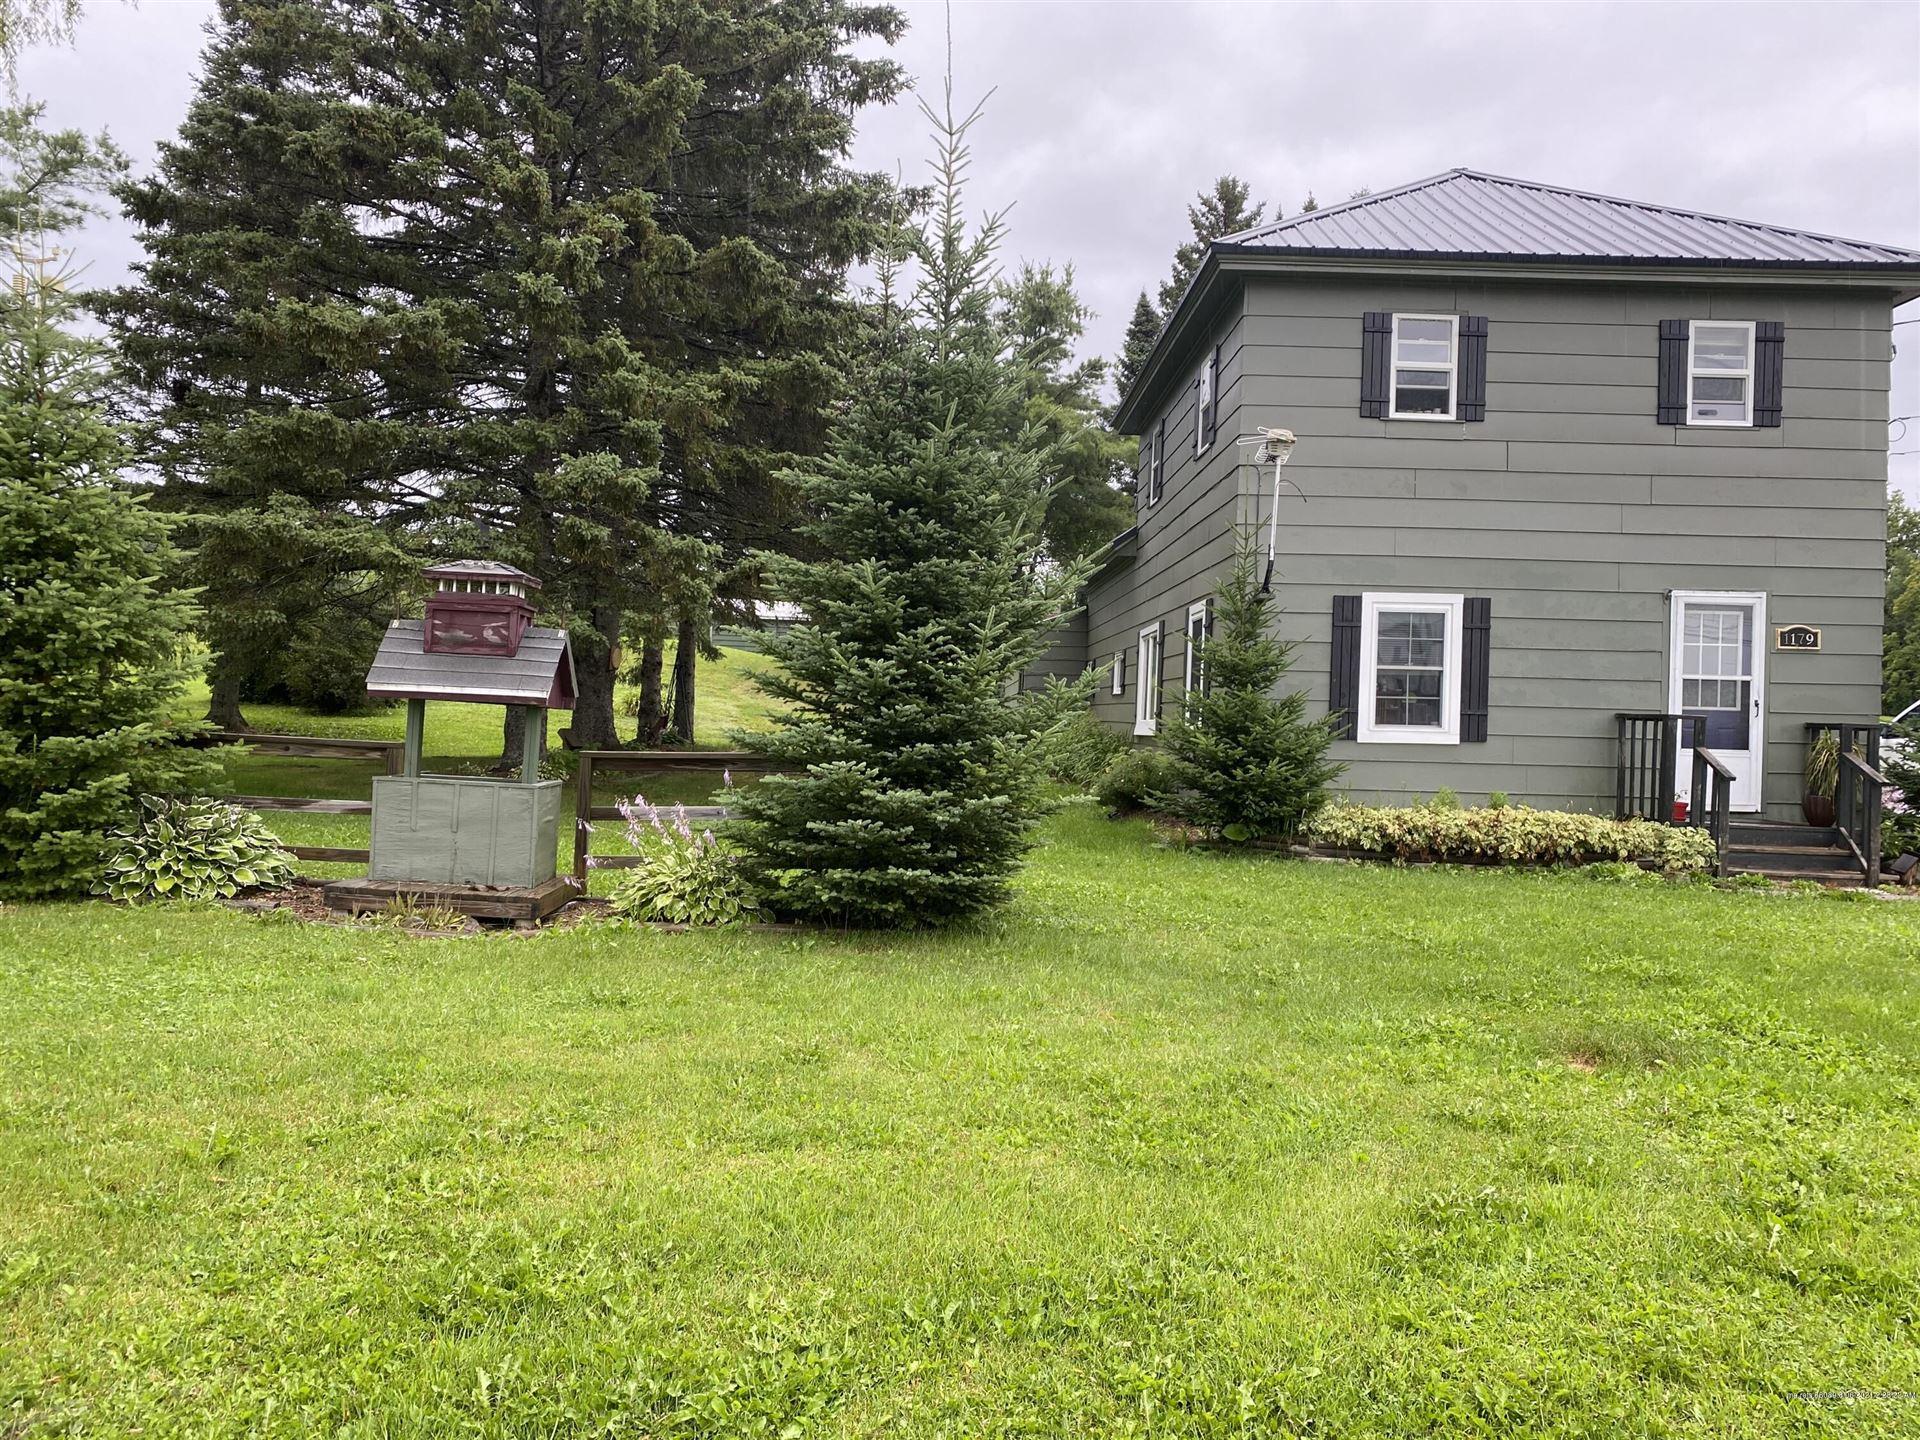 Photo of 1179 New Sweden Road, Woodland, ME 04736 (MLS # 1503773)